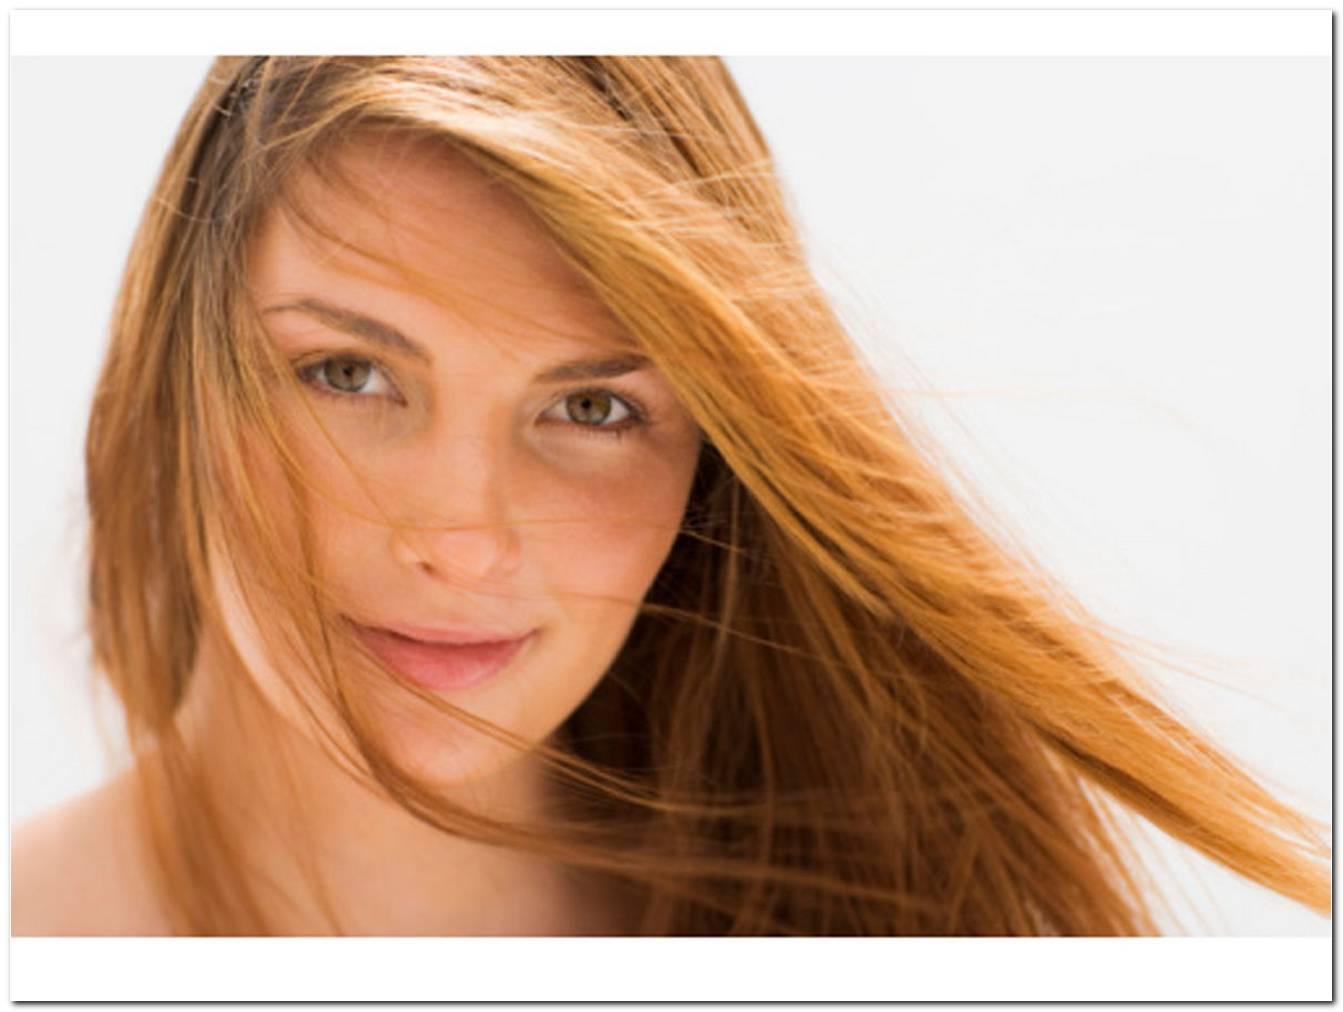 Frisuren Bei Geheimratsecken Frauen